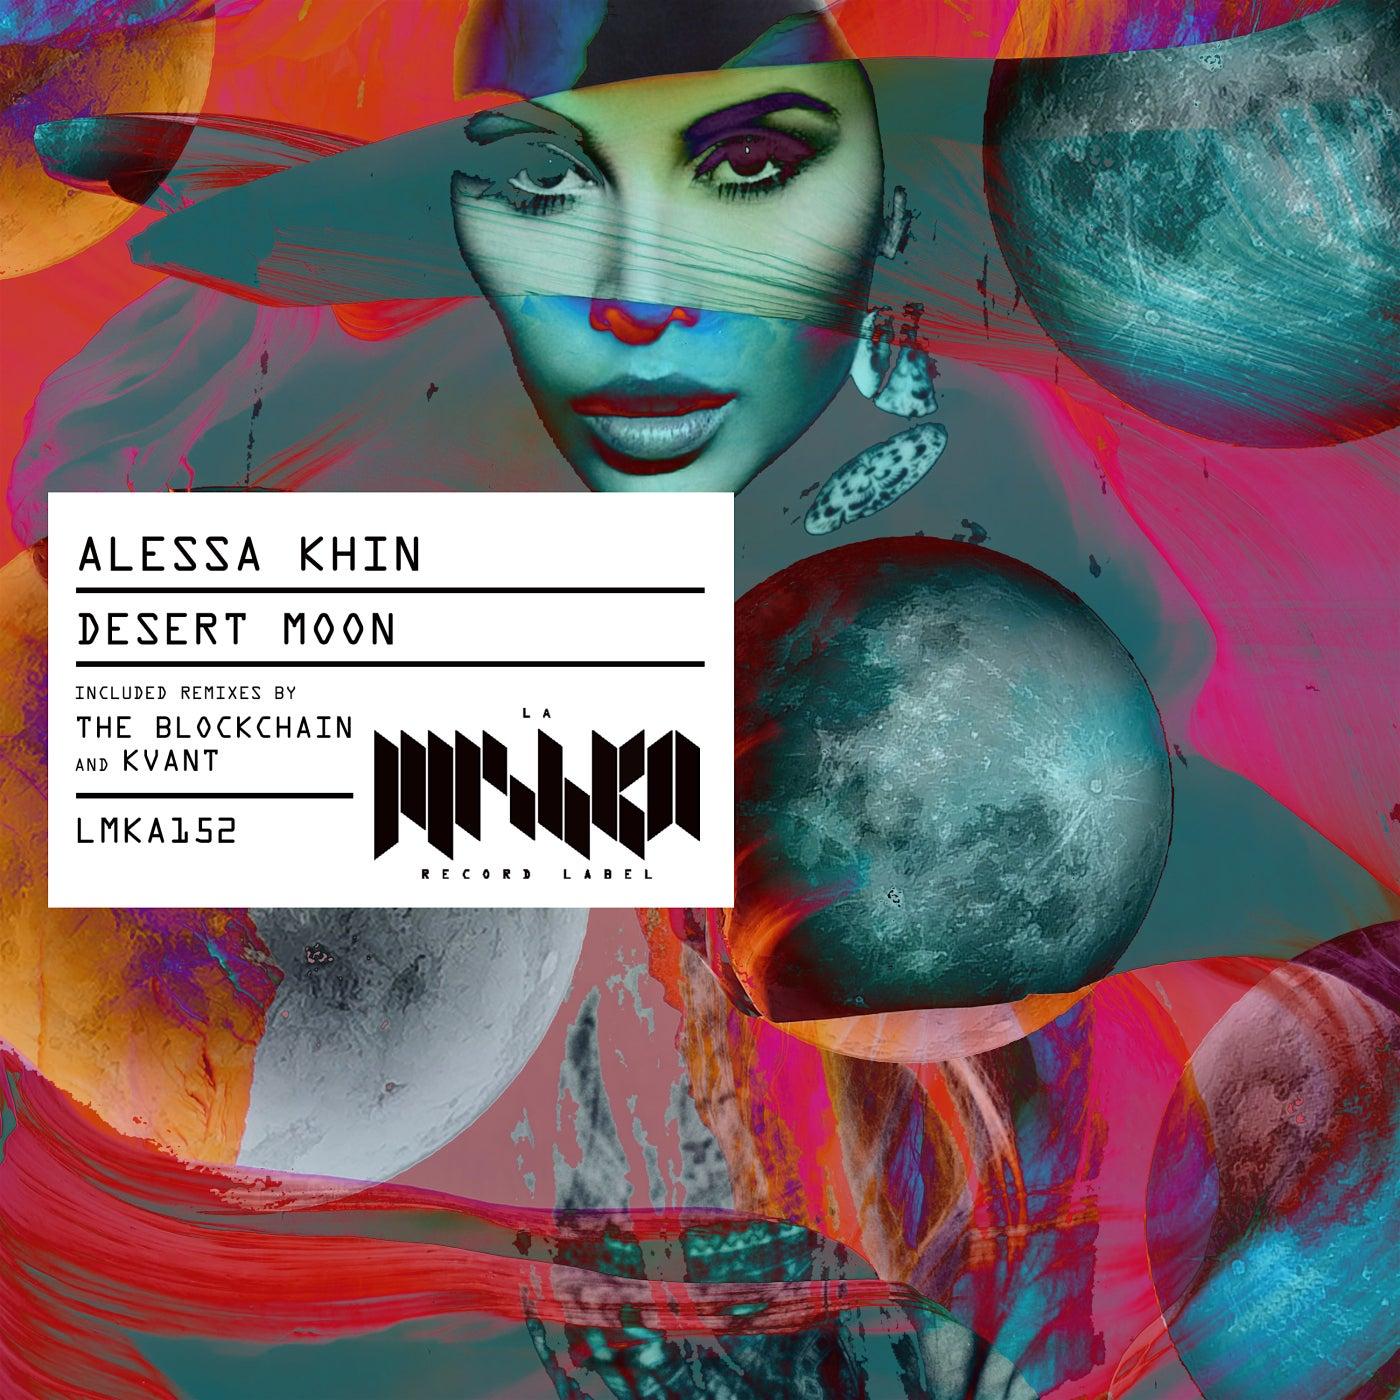 Desert Moon (Extended Mix)